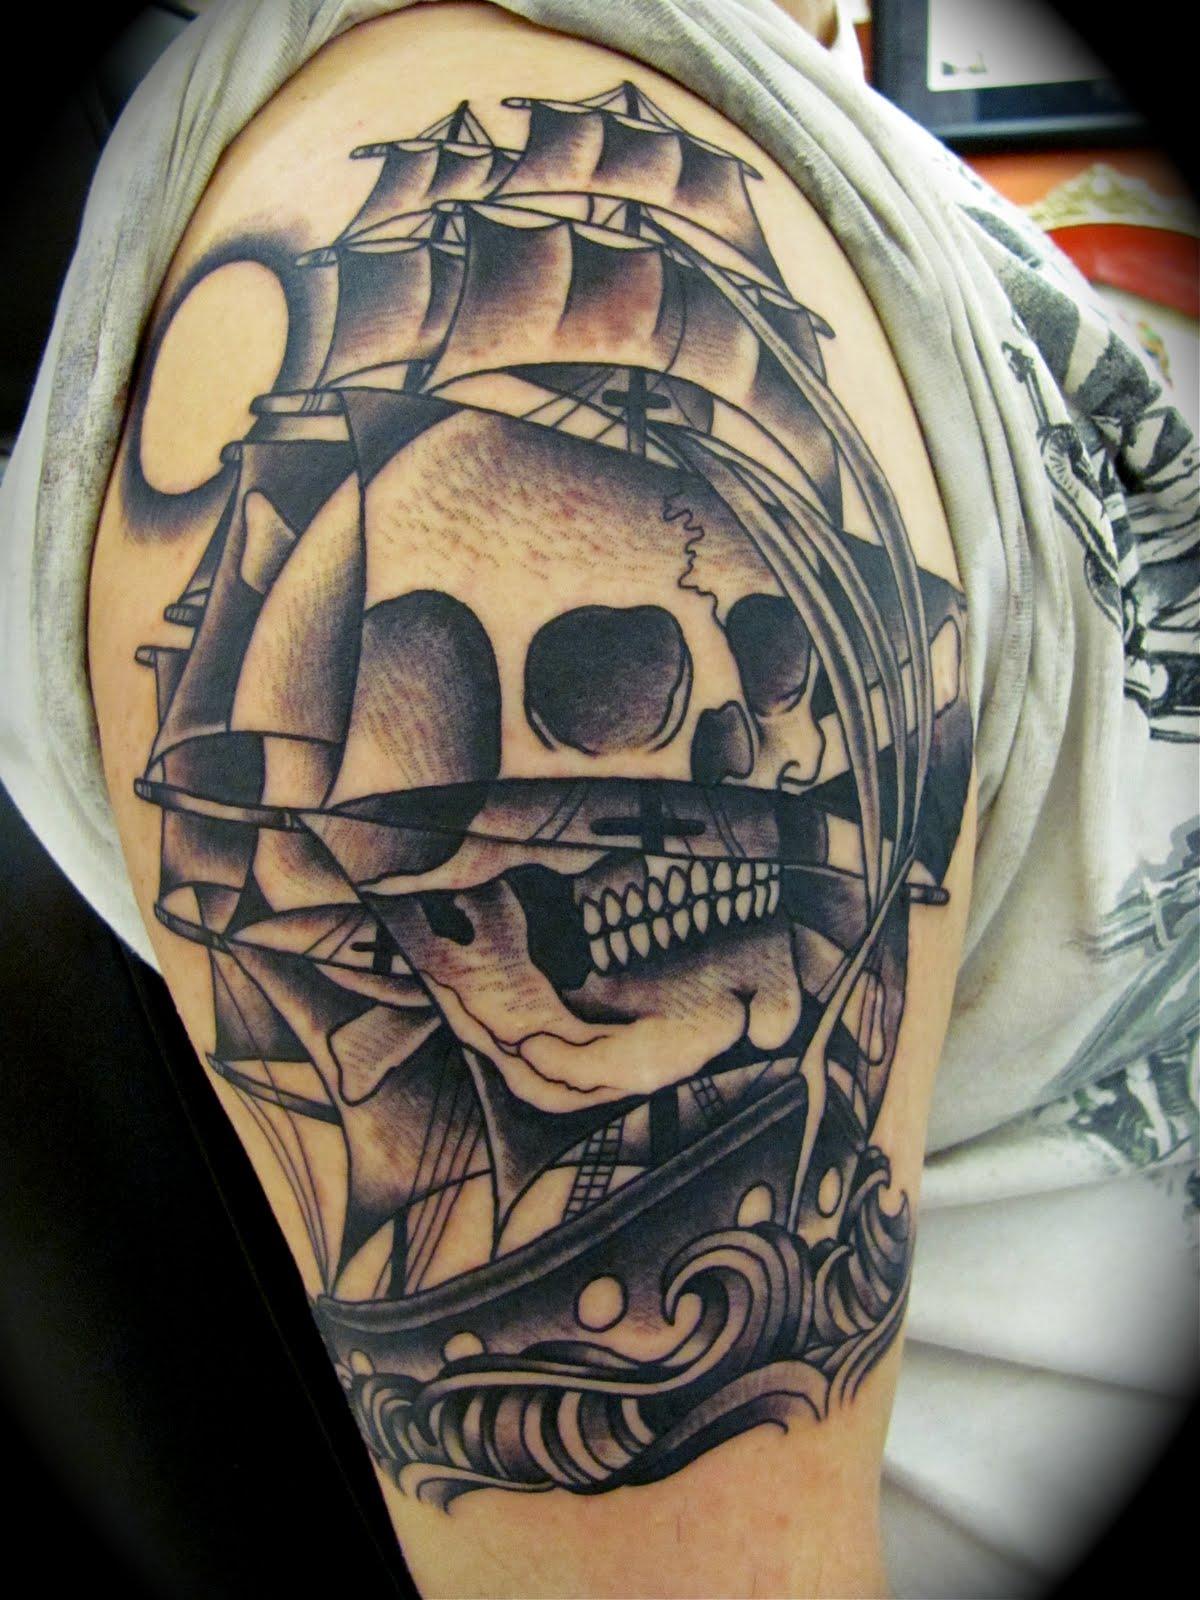 30 Ship Tattoos | Tattoofanblog  |Pirate Ship Tattoo